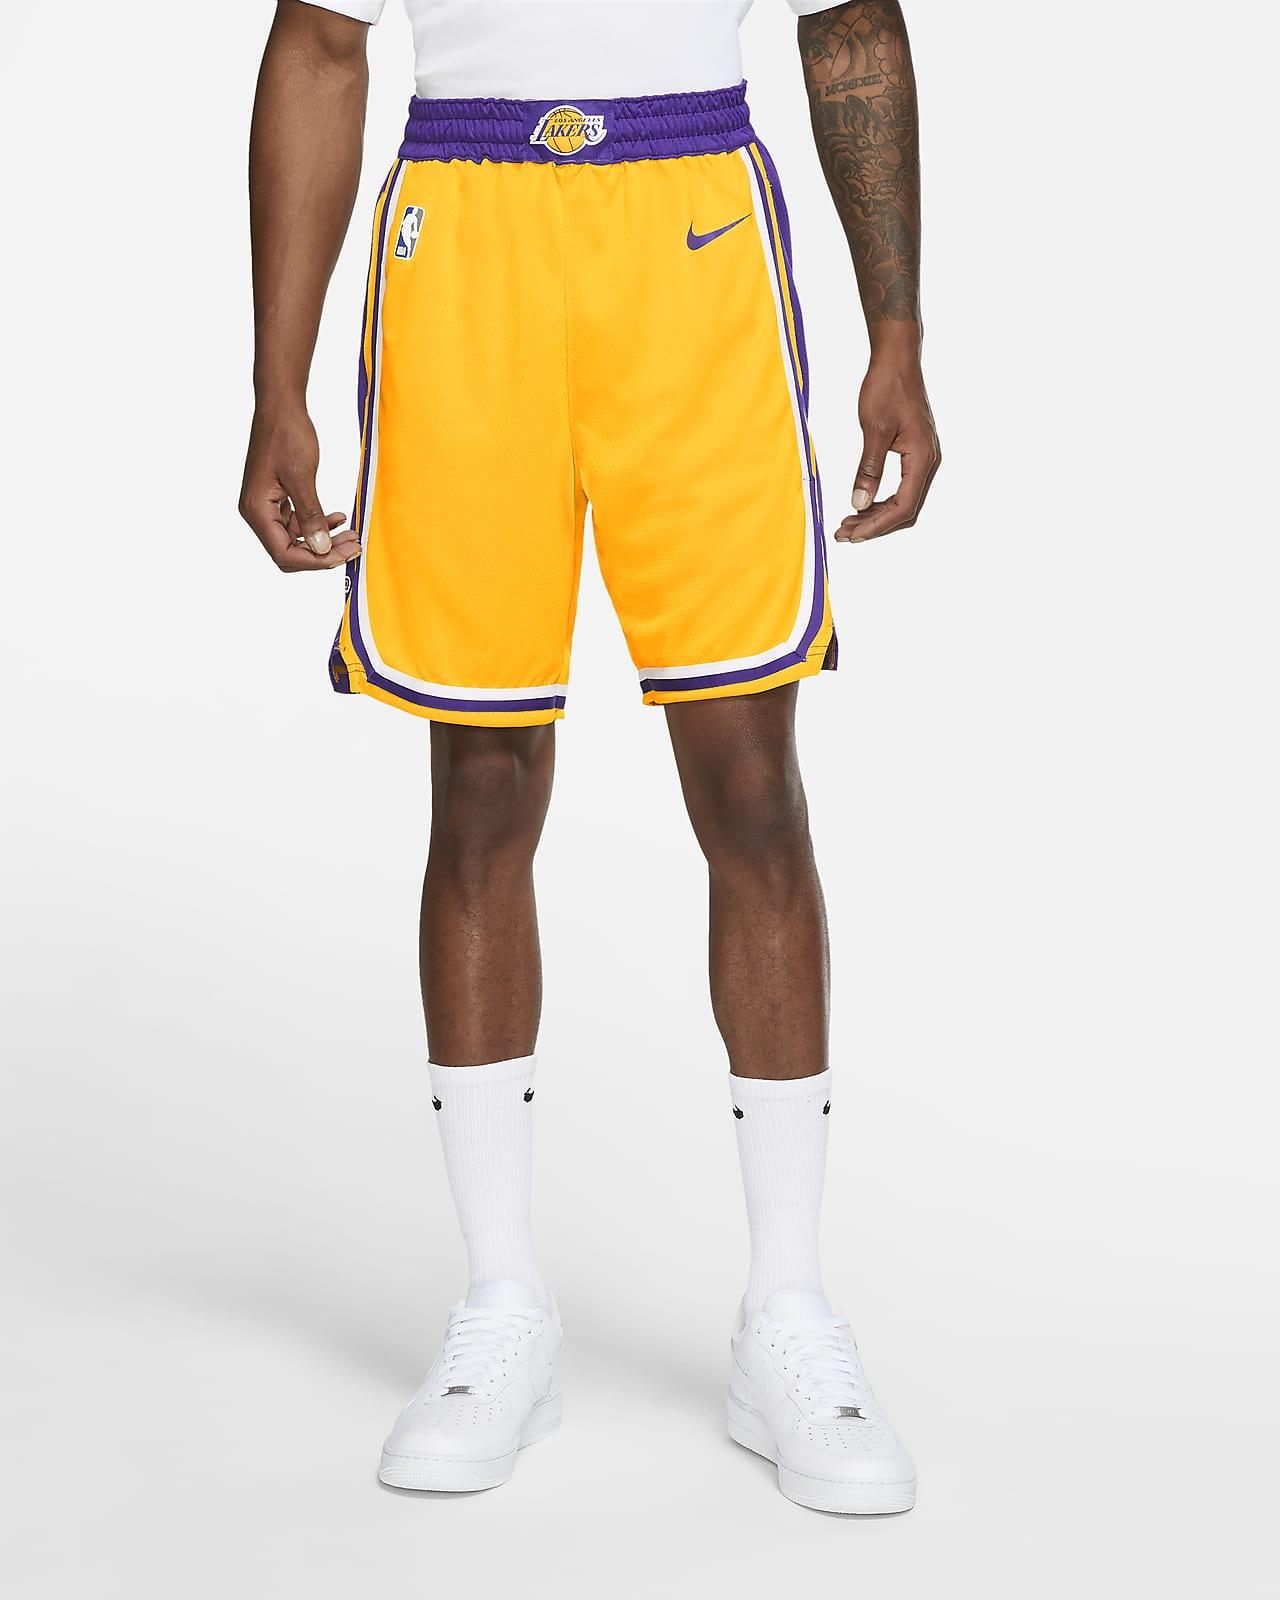 Los Angeles Lakers Icon Edition Nike NBA Swingman Erkek Şortu